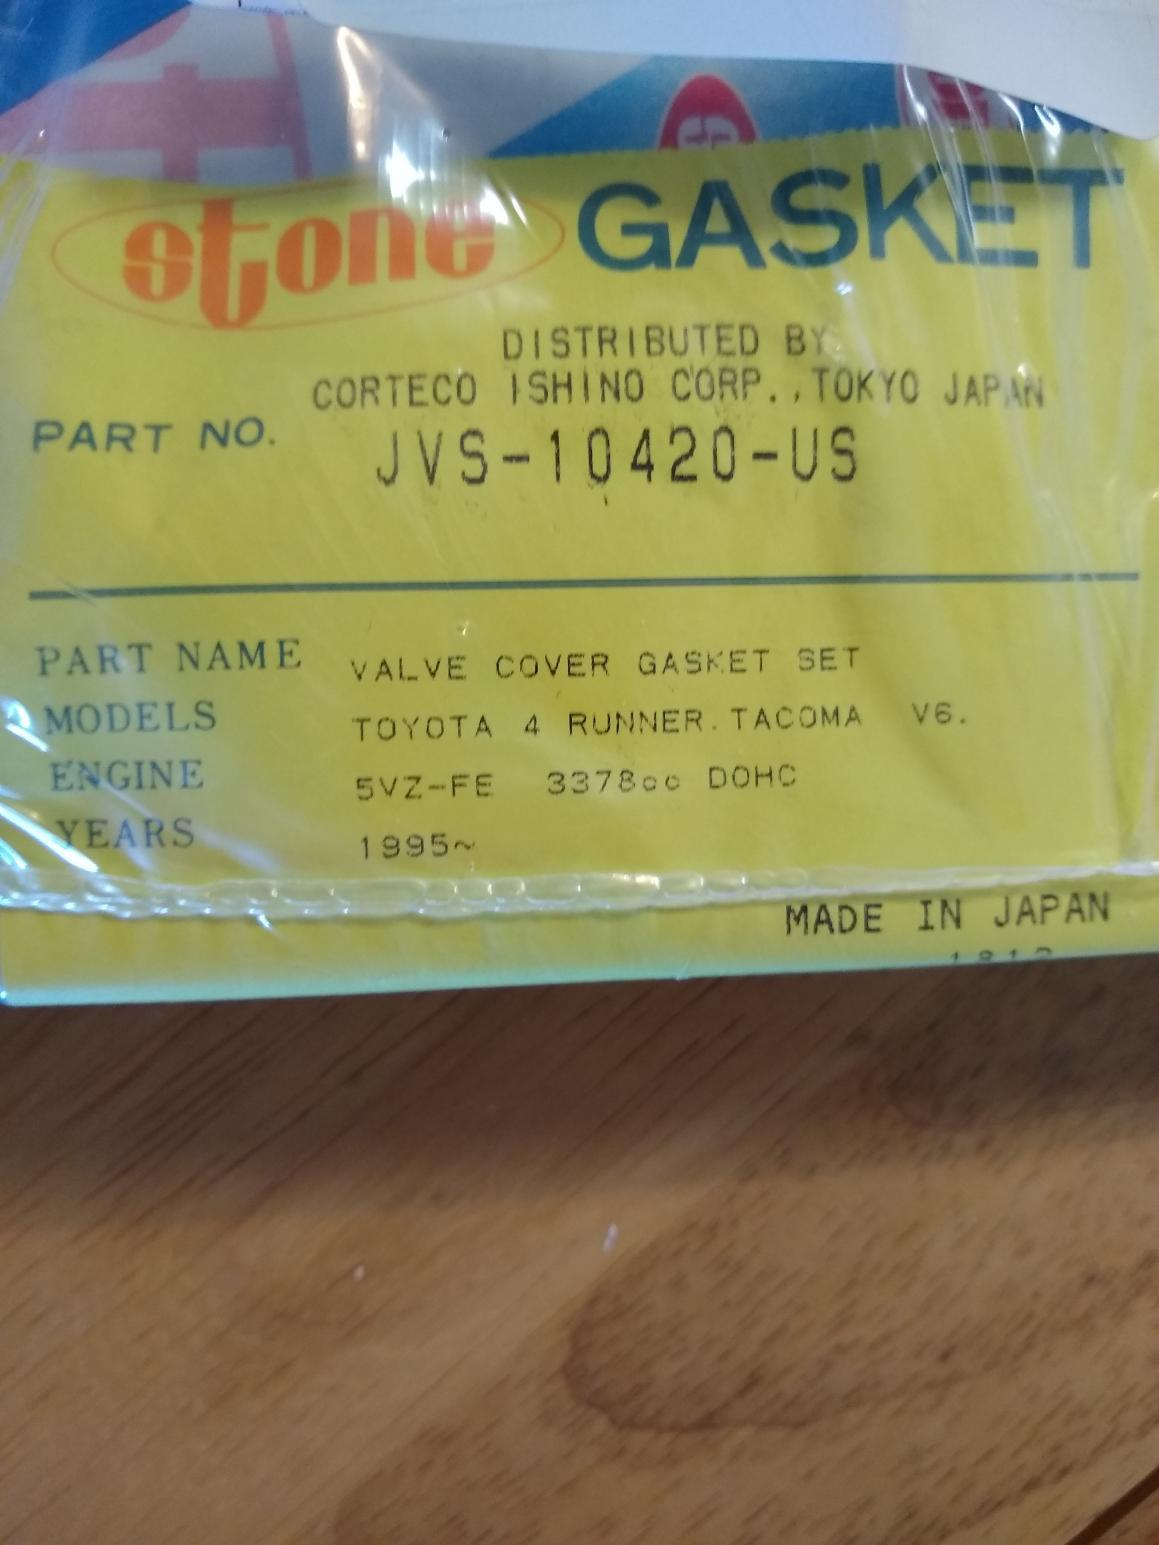 OEM eBay Valve Cover Gasket Kits-img_20200521_124219321_2-jpg